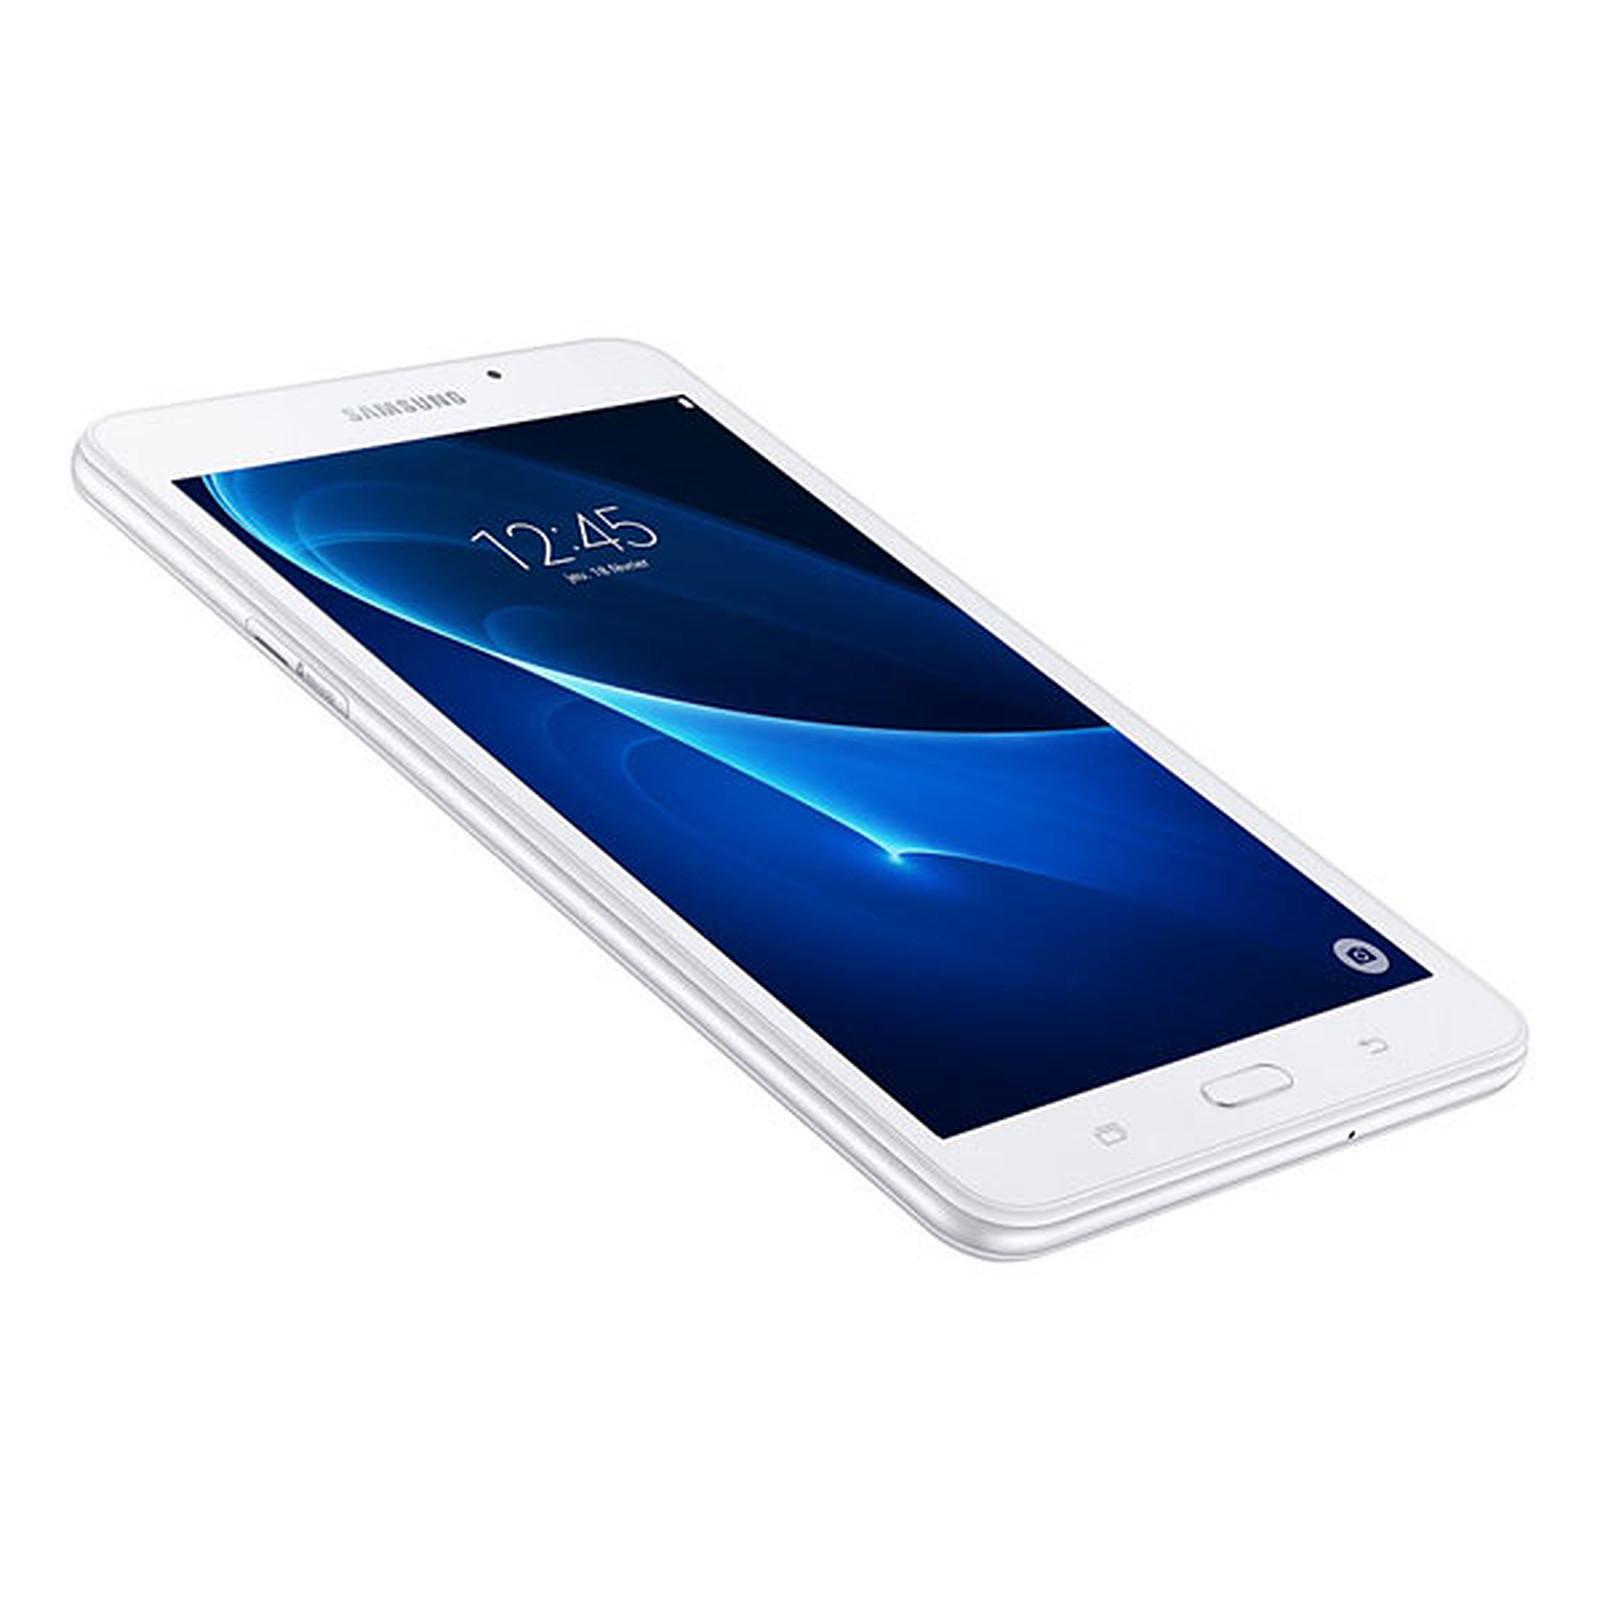 Samsung Galaxy Tab A6 SMT280 Tablet de 7 HD (WiFi